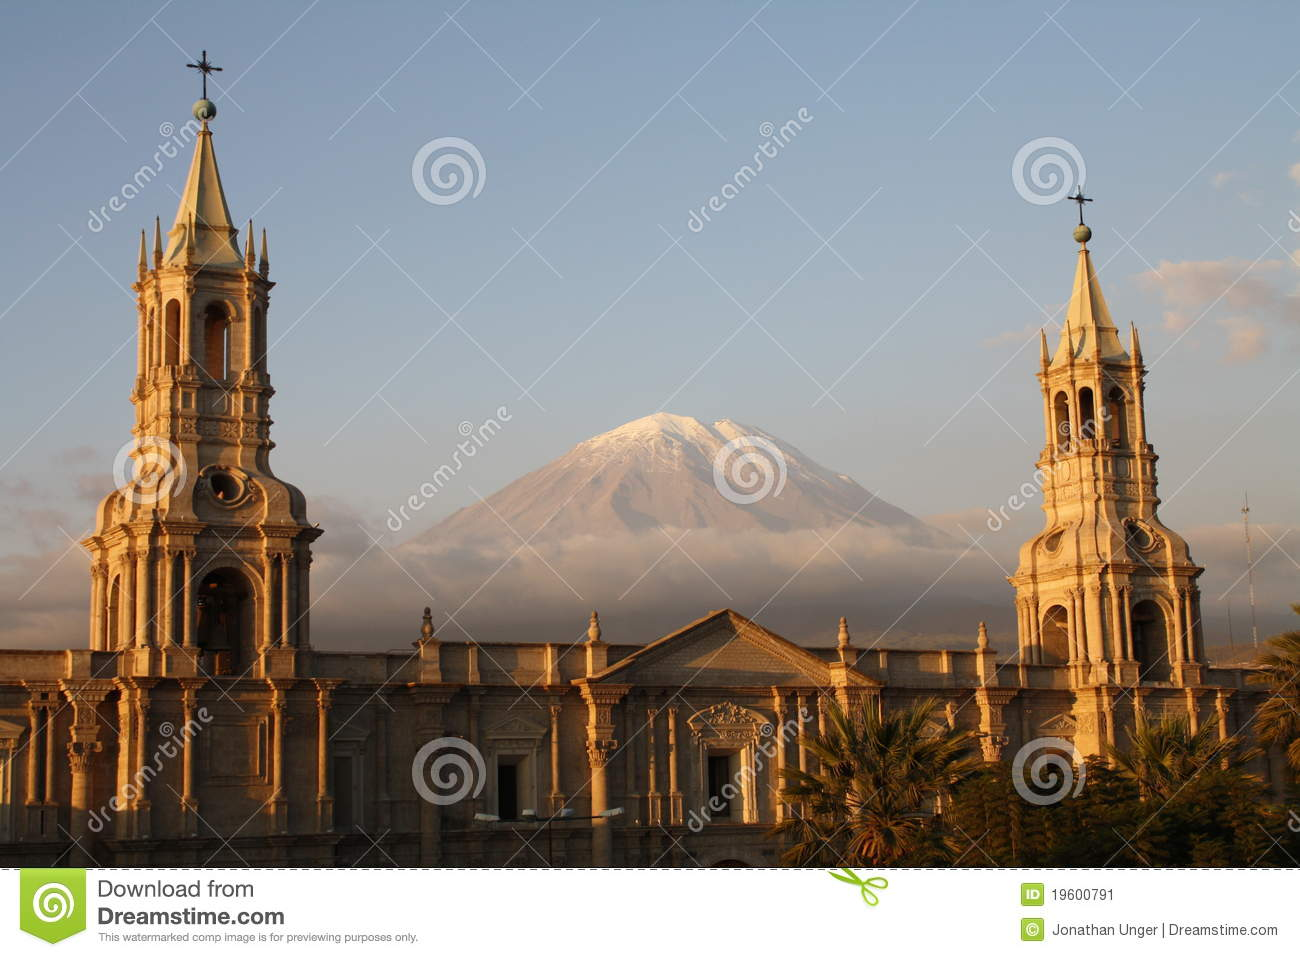 Plaza De Armas With El Misti Volcano, Arequipa Stock Image.